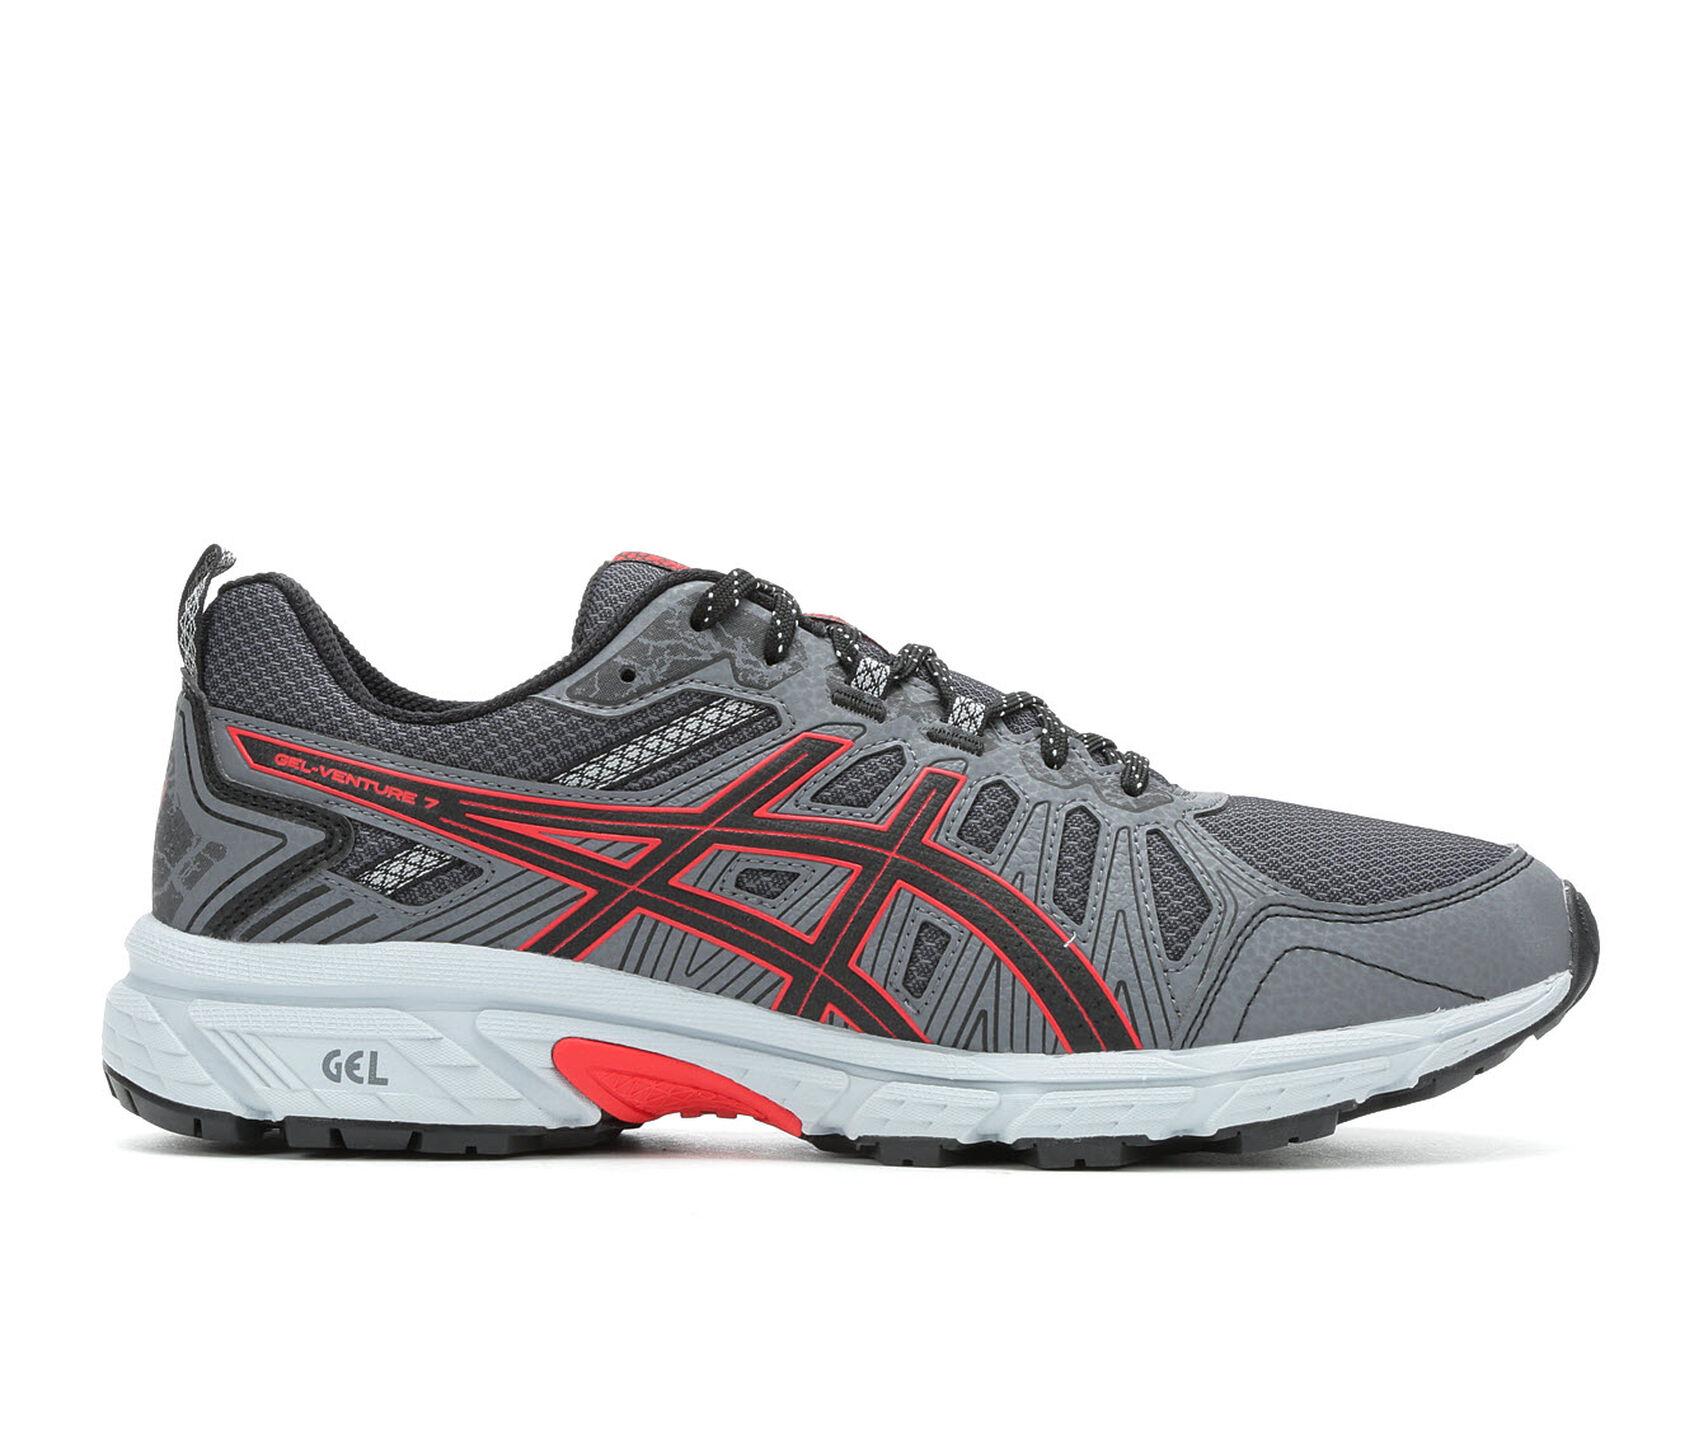 a5abb73abc Men's ASICS Gel Venture 7 Trail Running Shoes